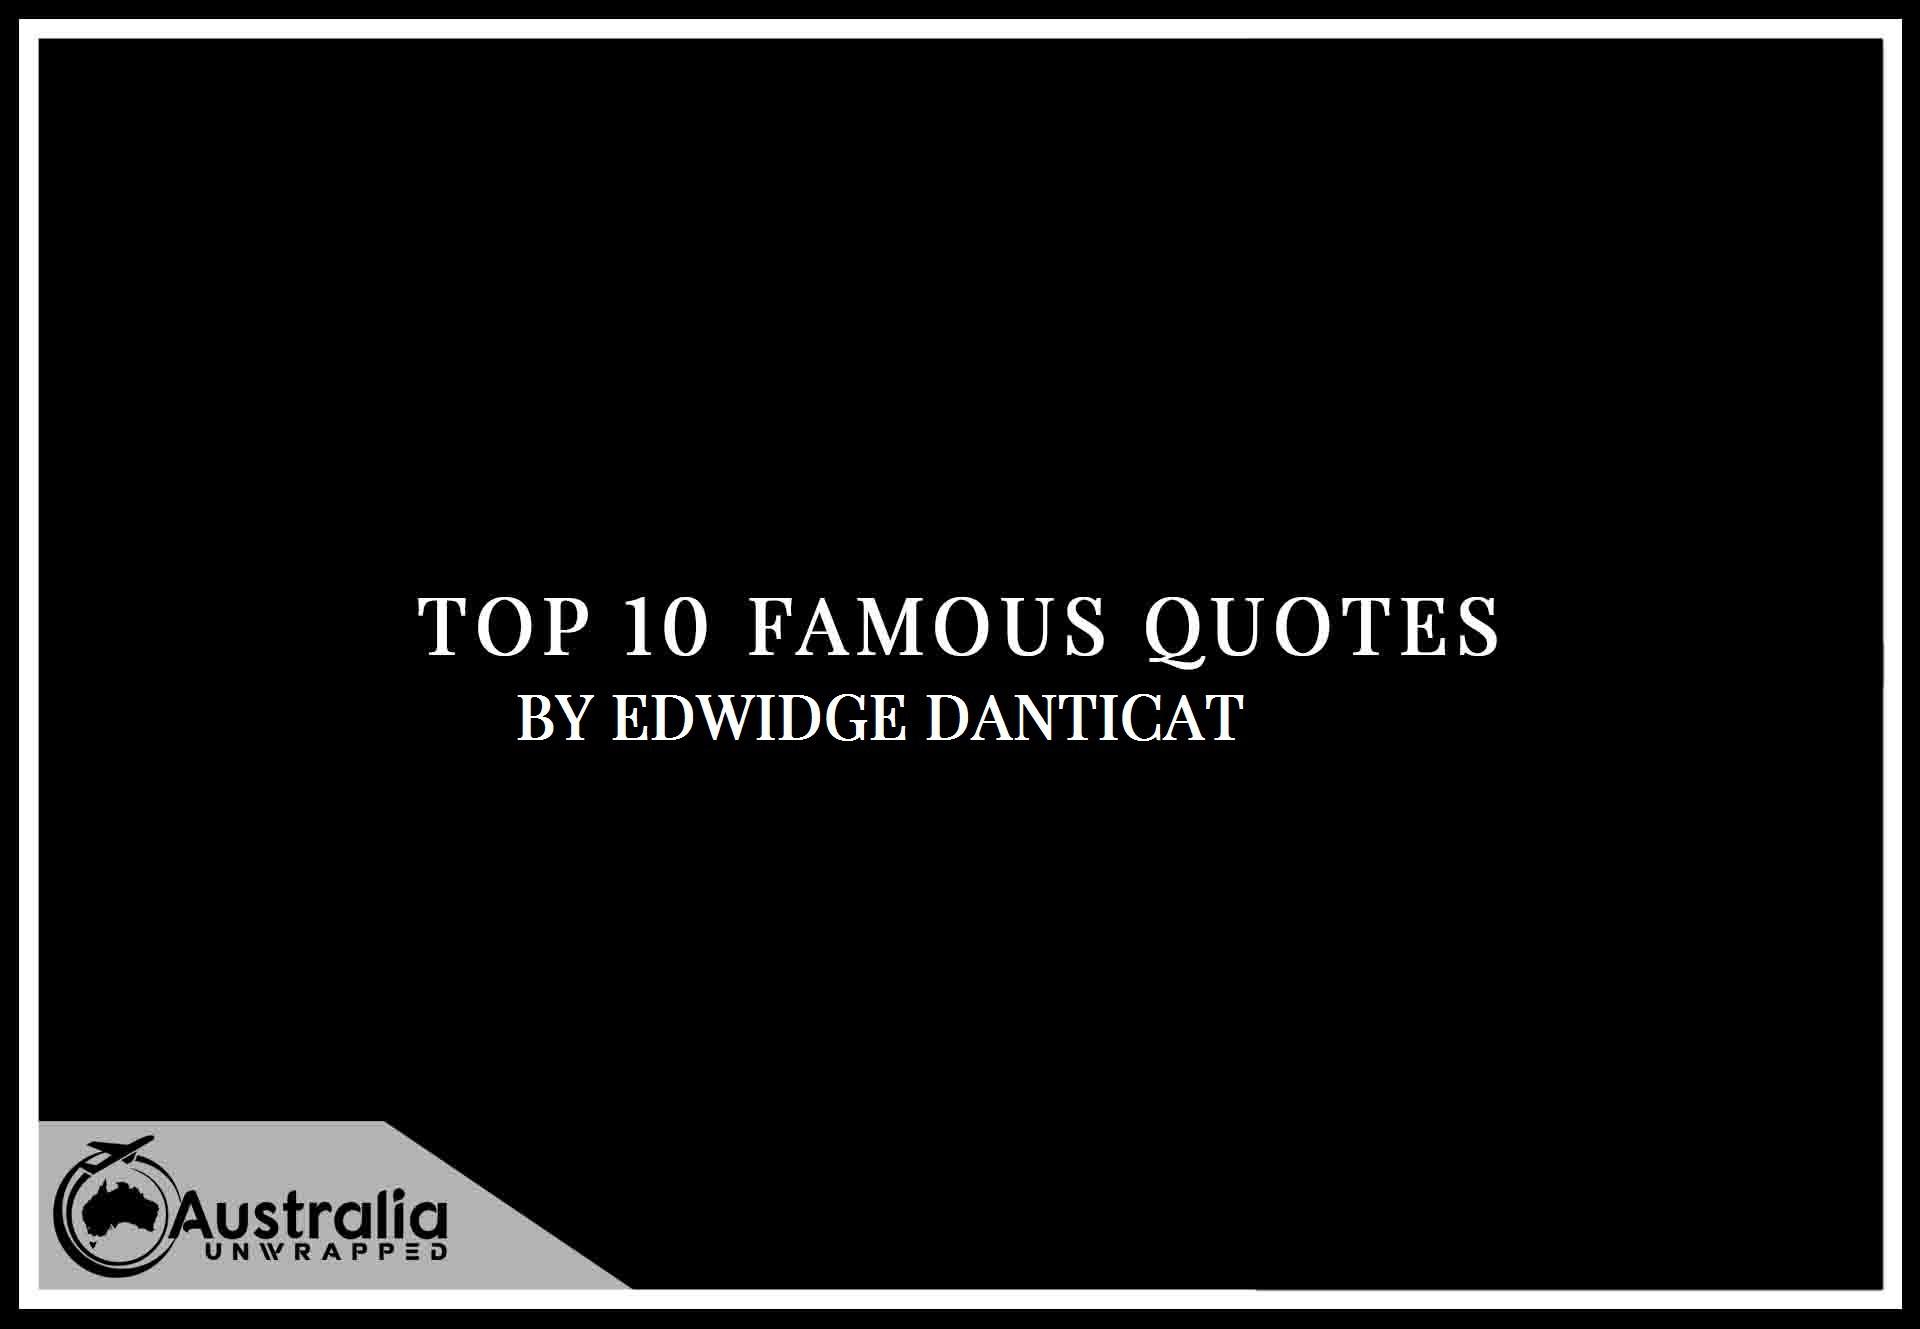 Edwidge Danticat's Top 10 Popular and Famous Quotes